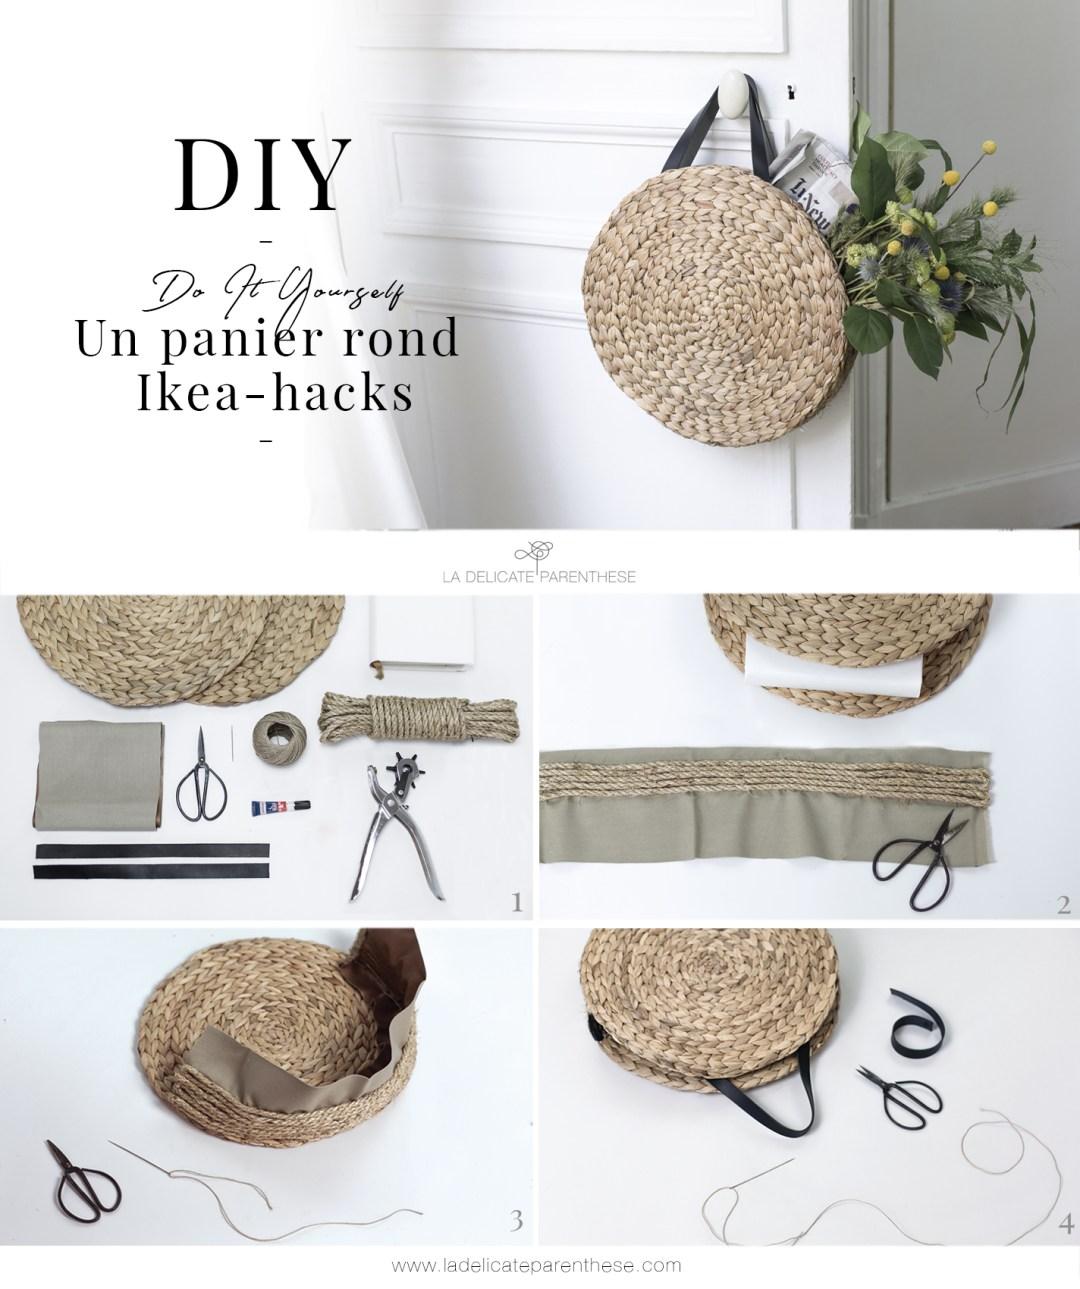 creation DIY panier rond grâce au IKEA HACK